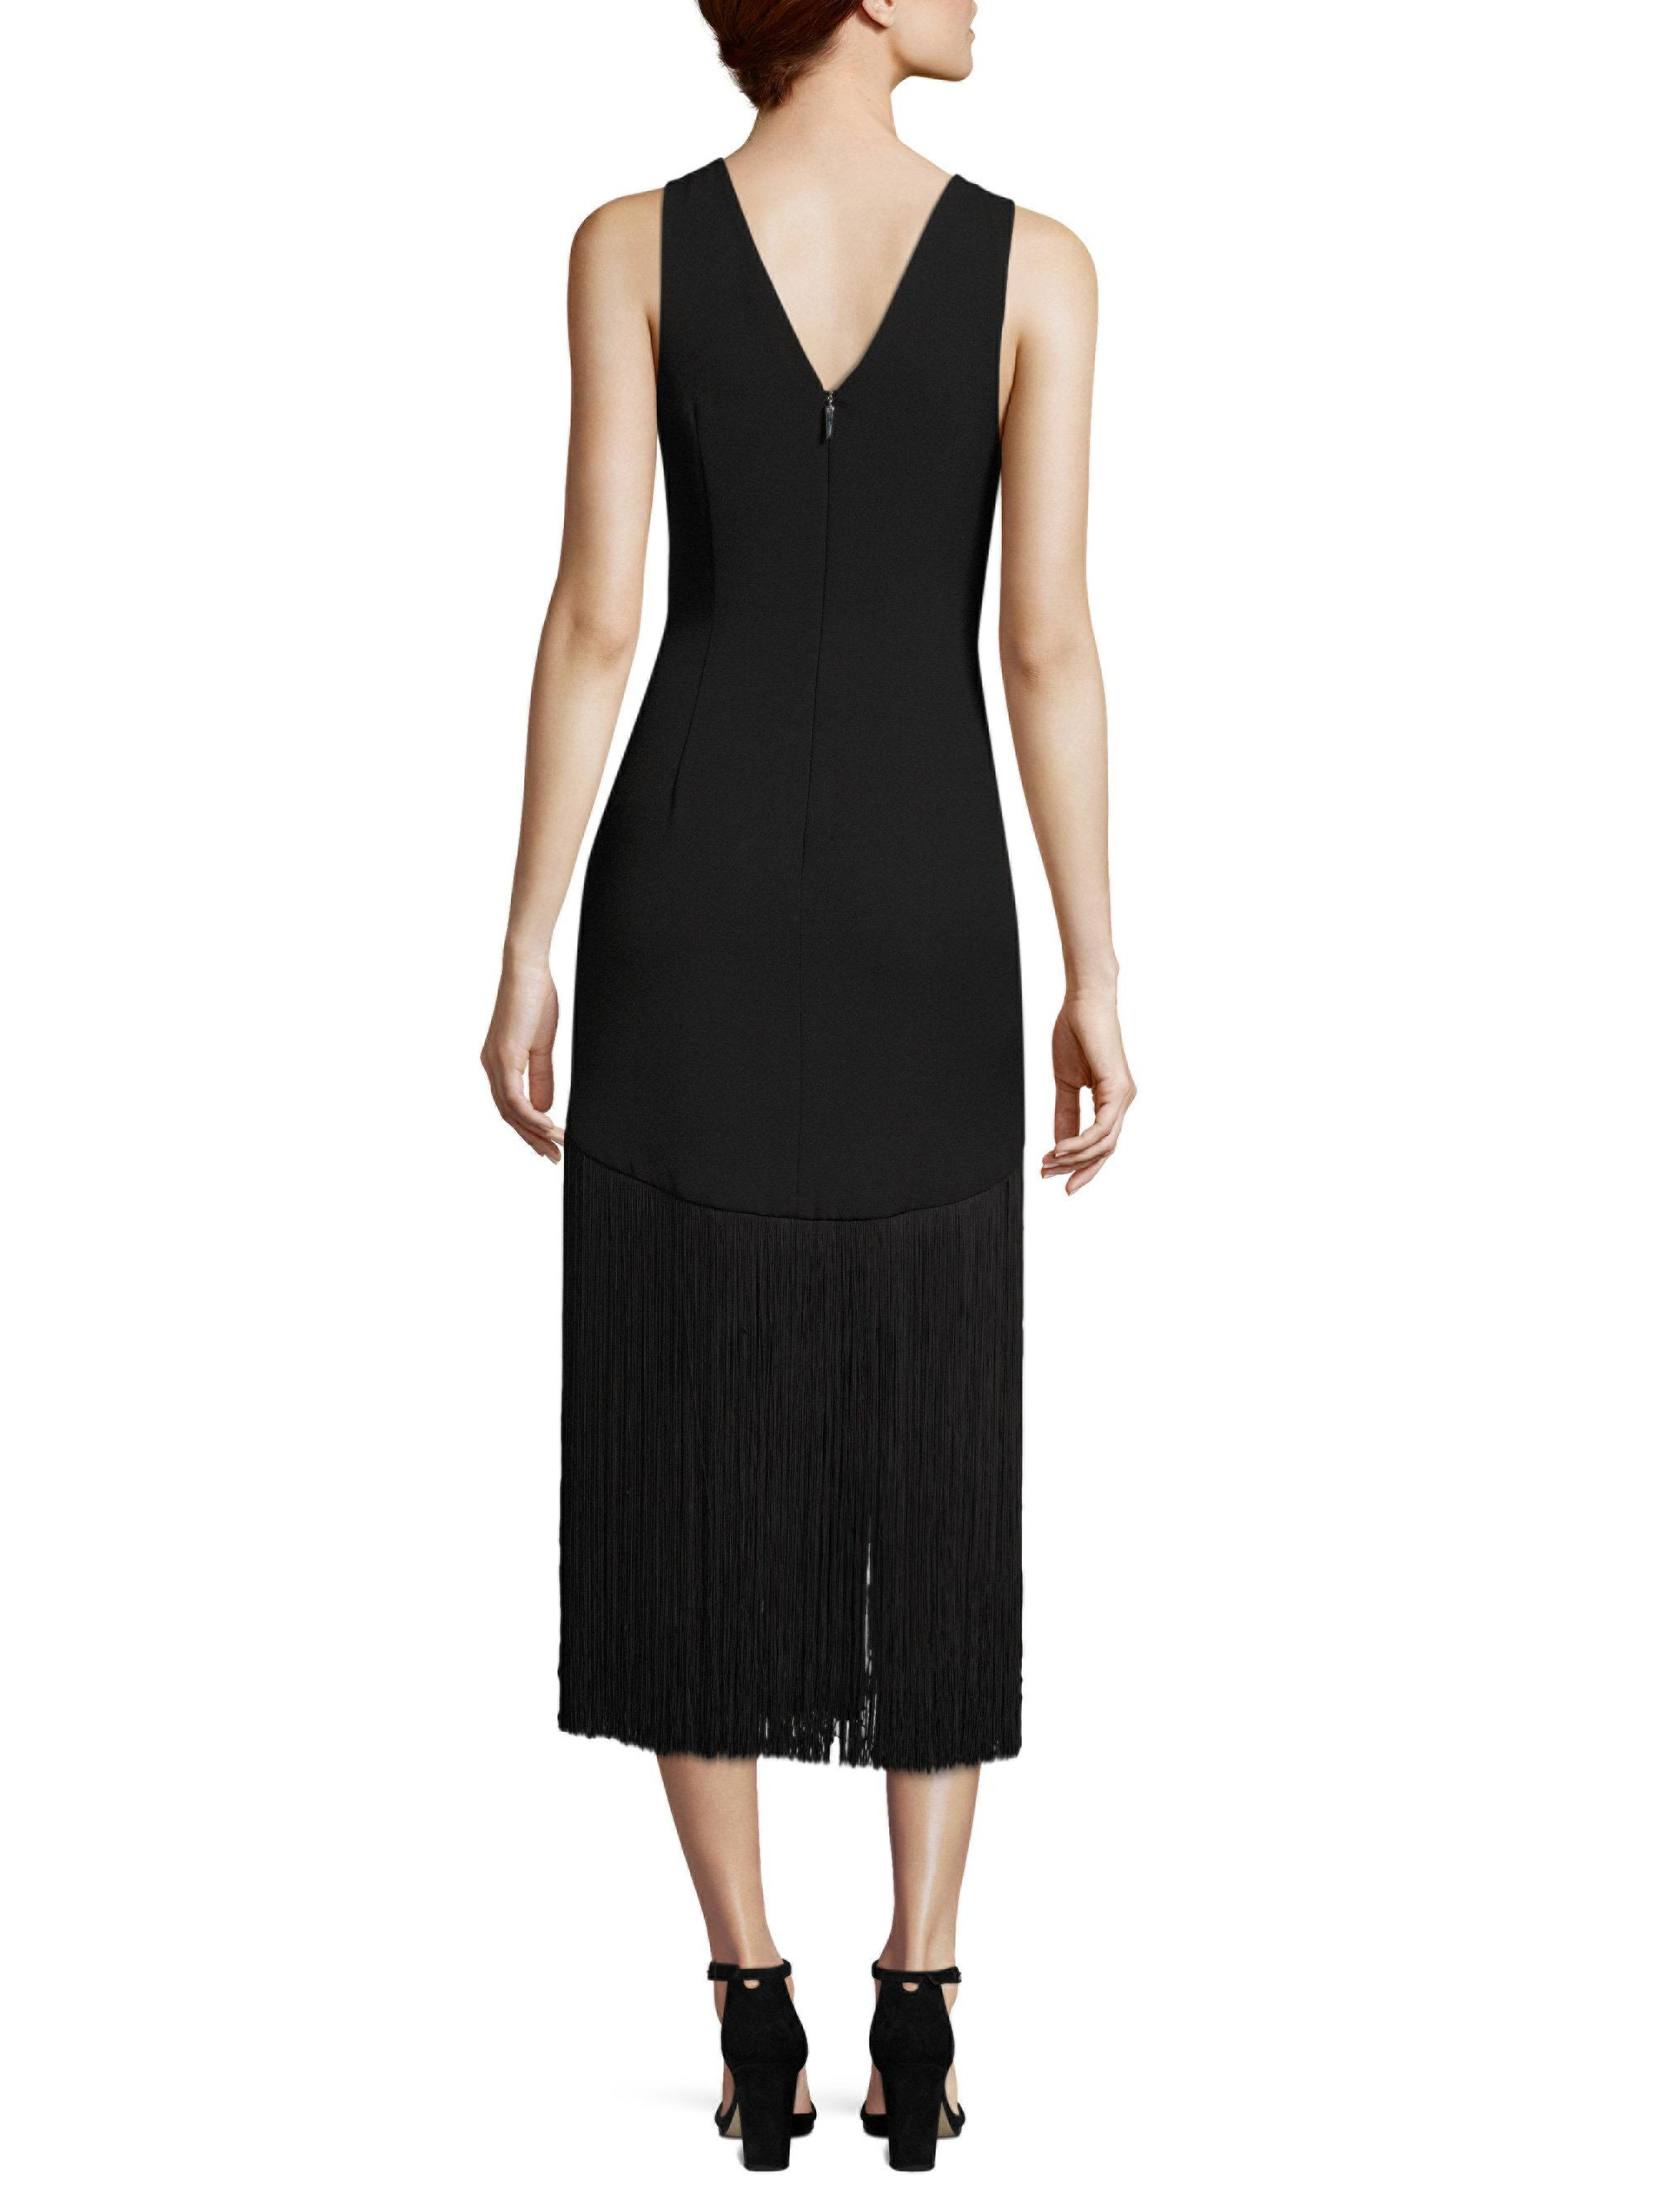 Lyst prabal gurung fringe sheath dress in black for Saks fifth avenue wedding guest dresses